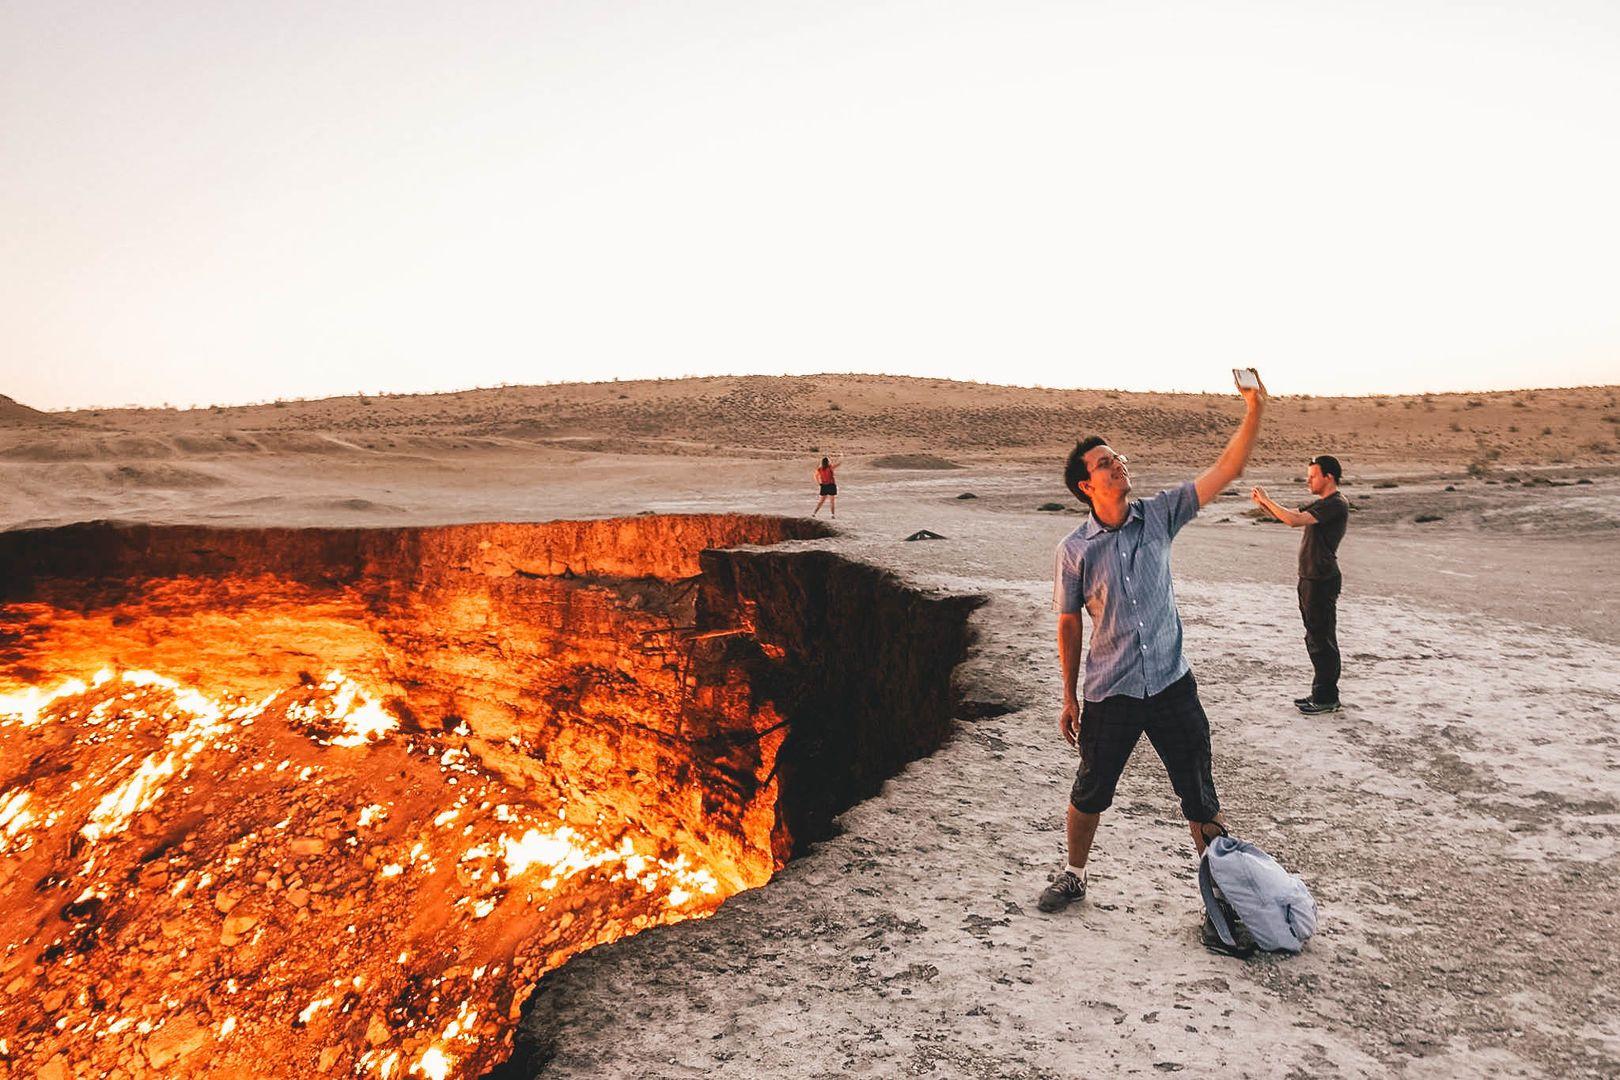 Khiva – Kunya Urgench – Darvaza Gas Crater (450km, 8h)